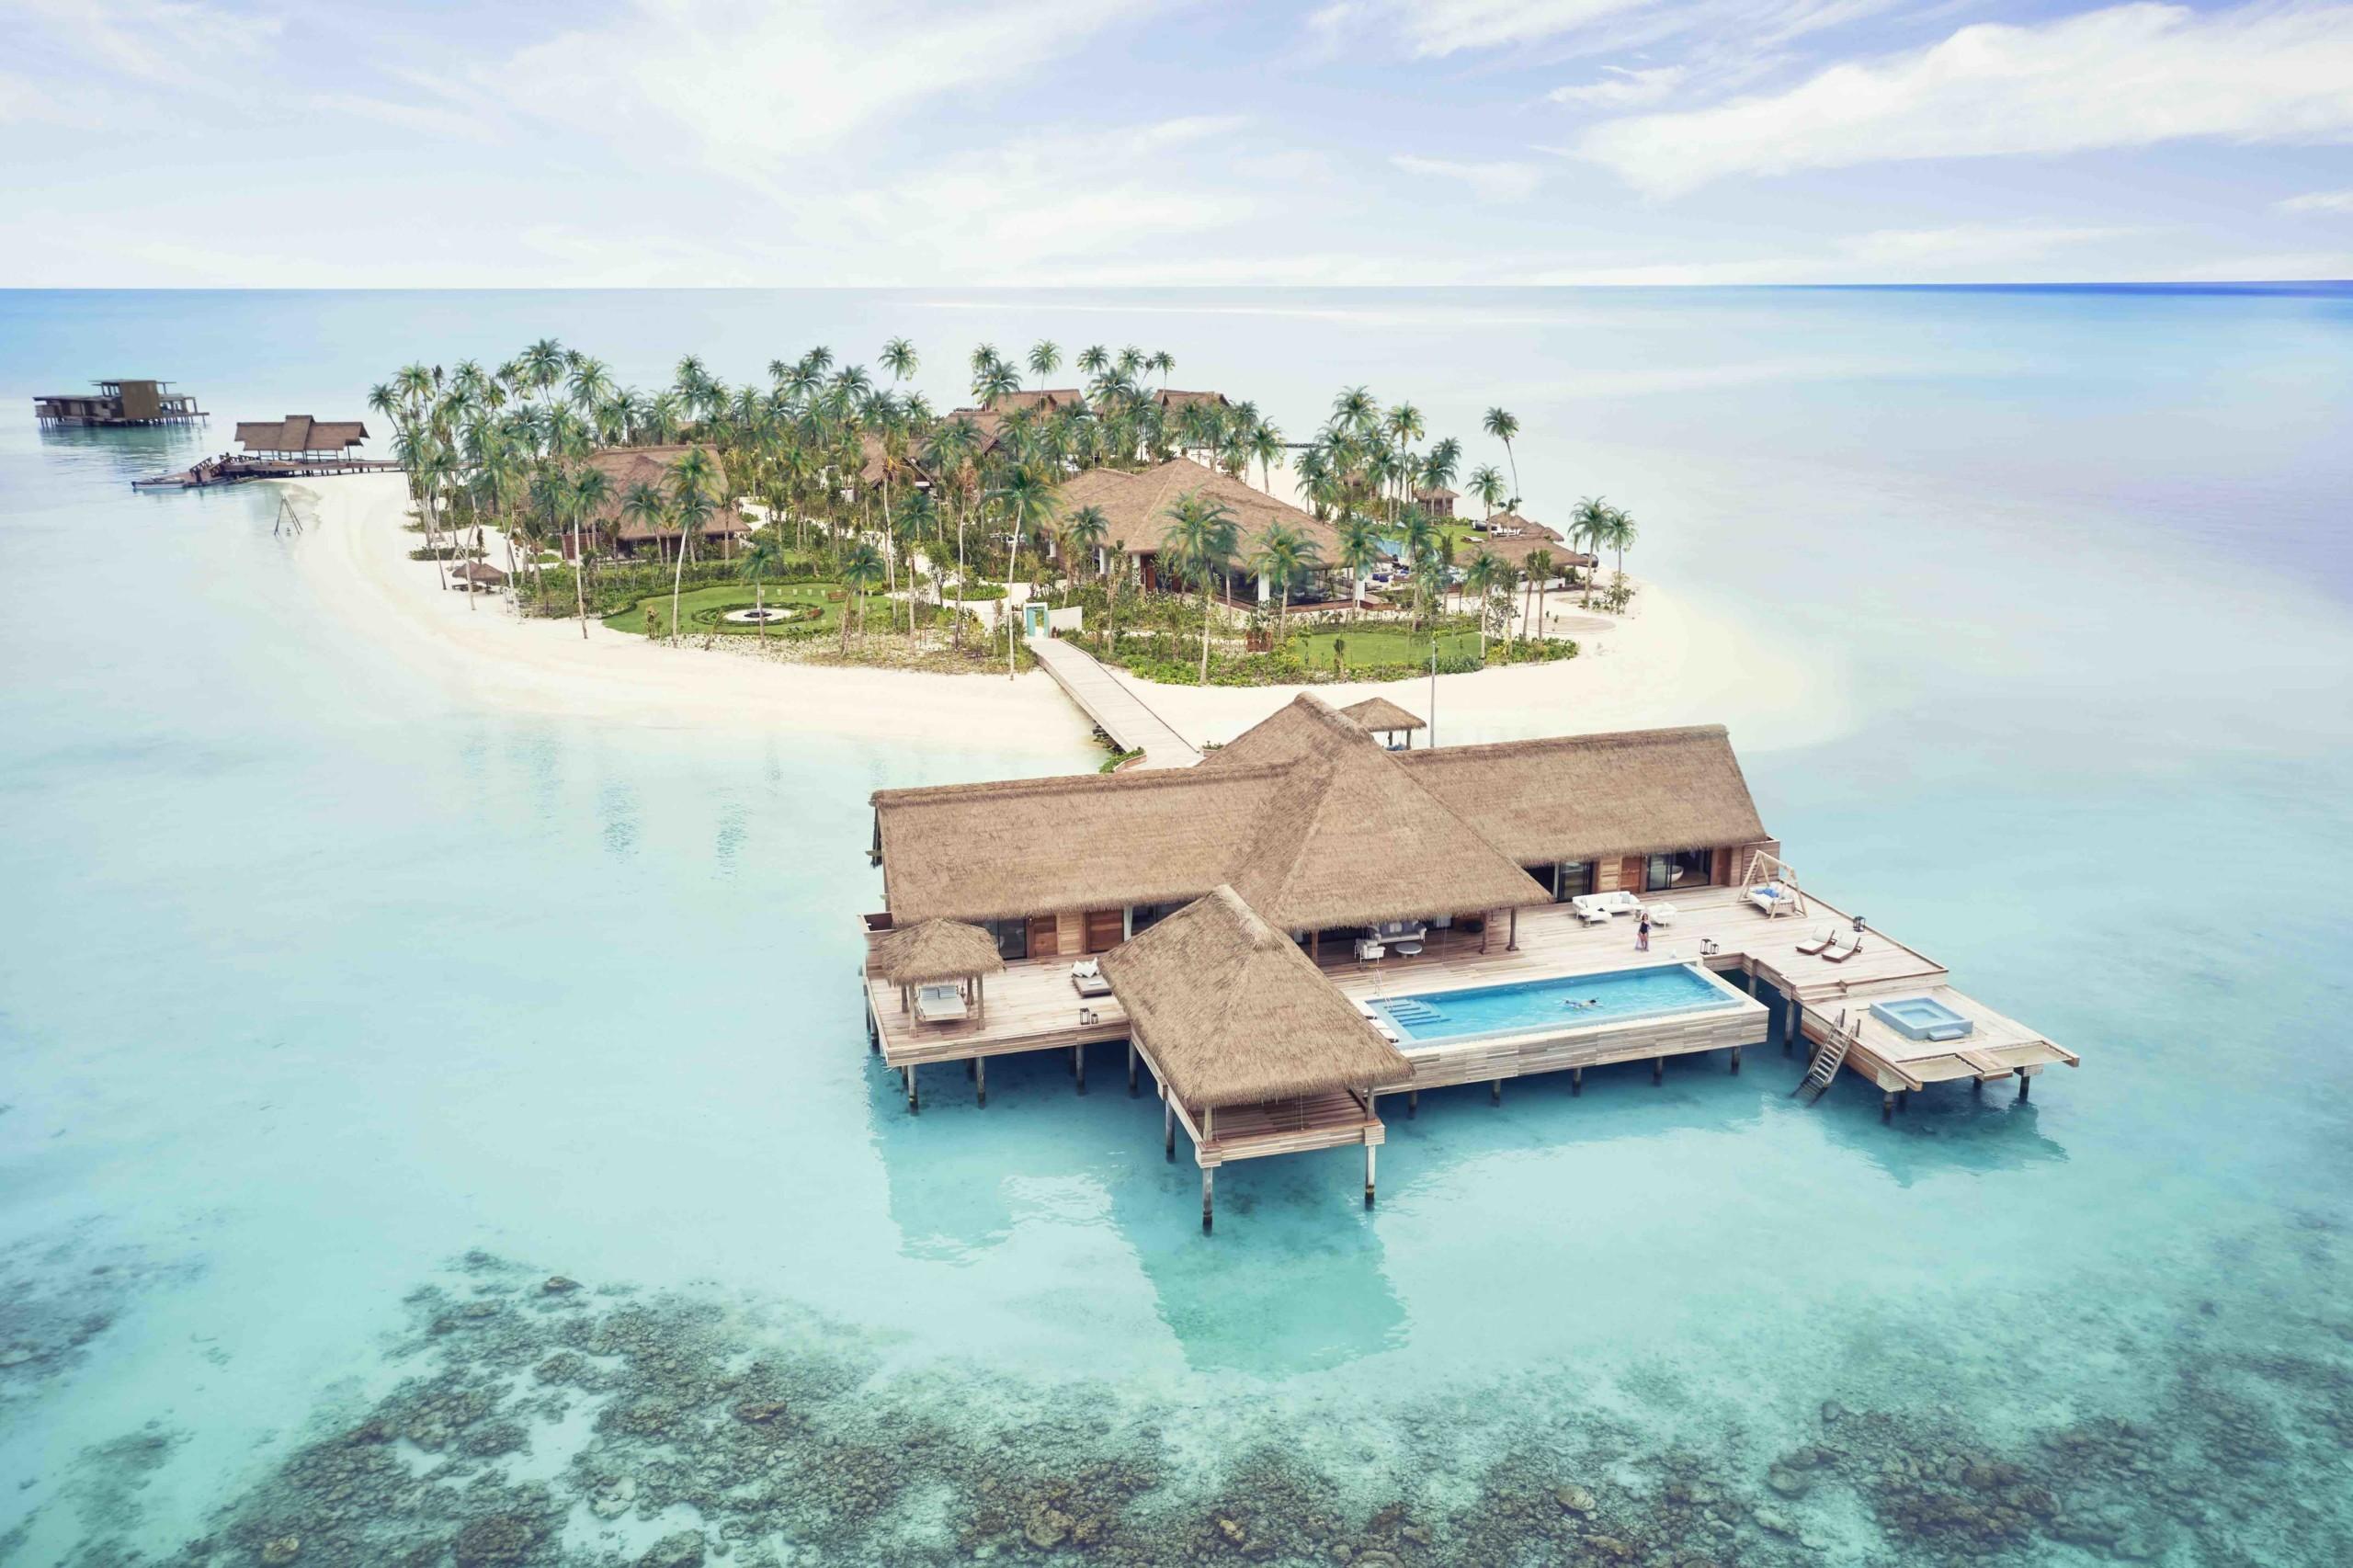 Urlaub im Inselparadies Waldorf Astoria Maldives Ithaafushi